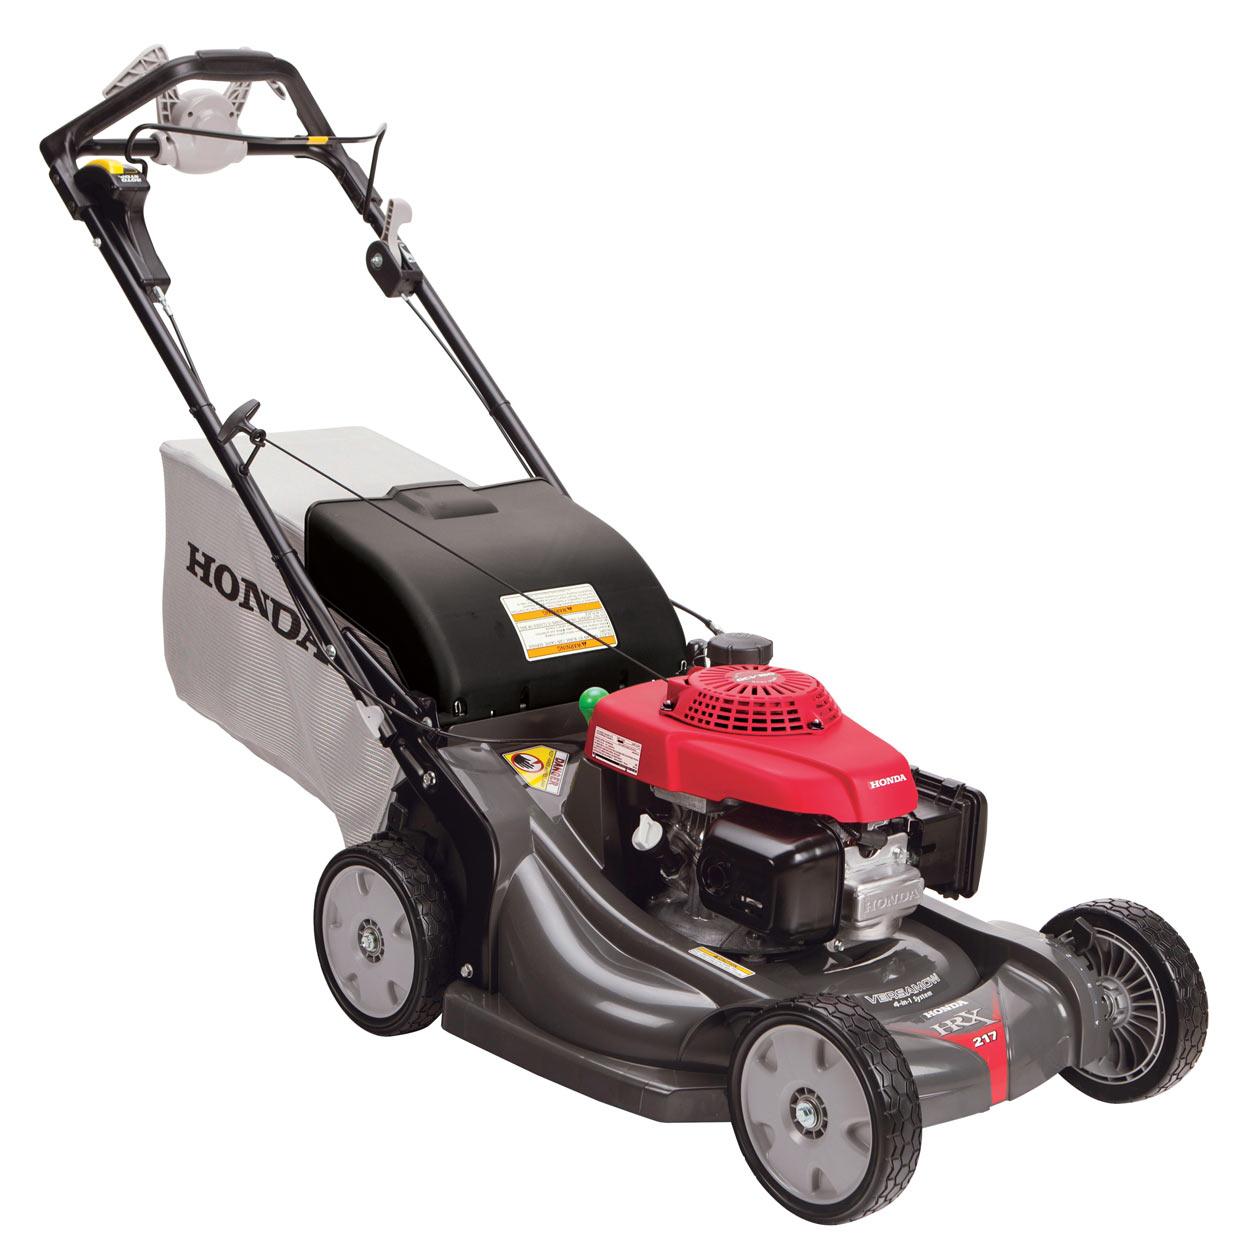 roller garden product lawnmower machinery sims self mower qxe honda mowers propelled